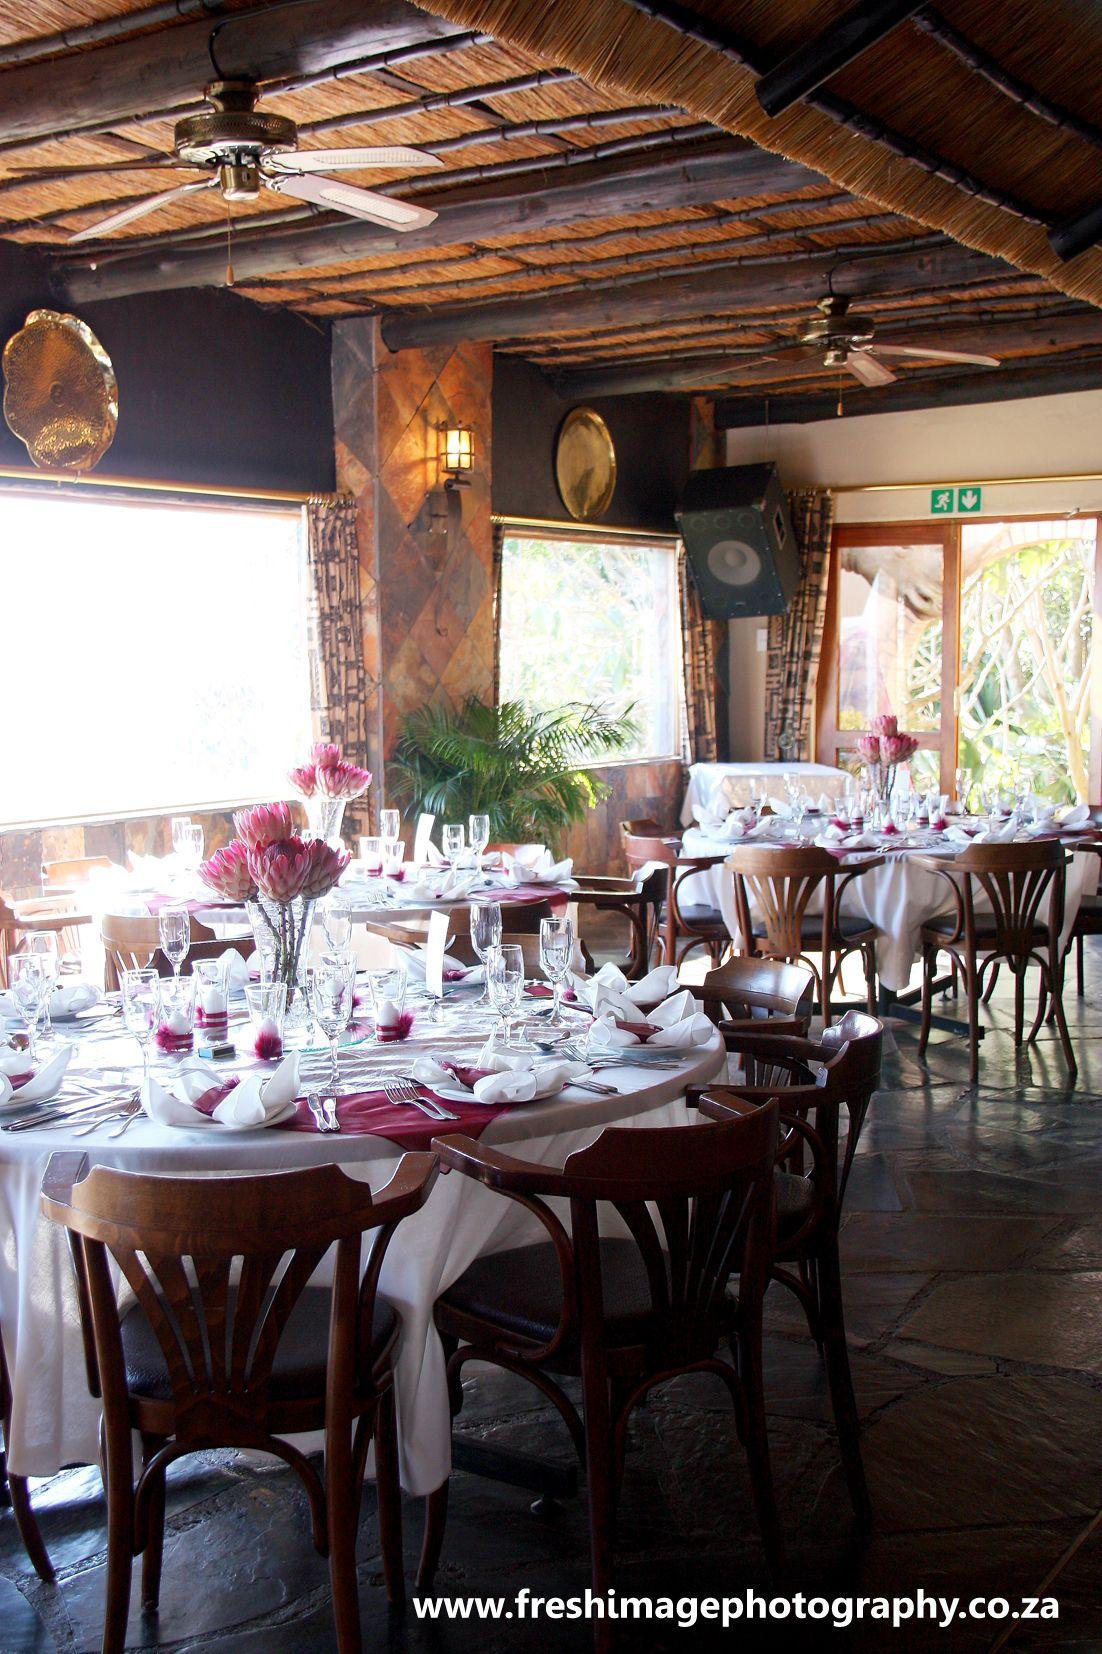 Bhowani Game Lodge Make A Lodges Wedding Venues: Wedding Venues In Zimbabwe At Reisefeber.org